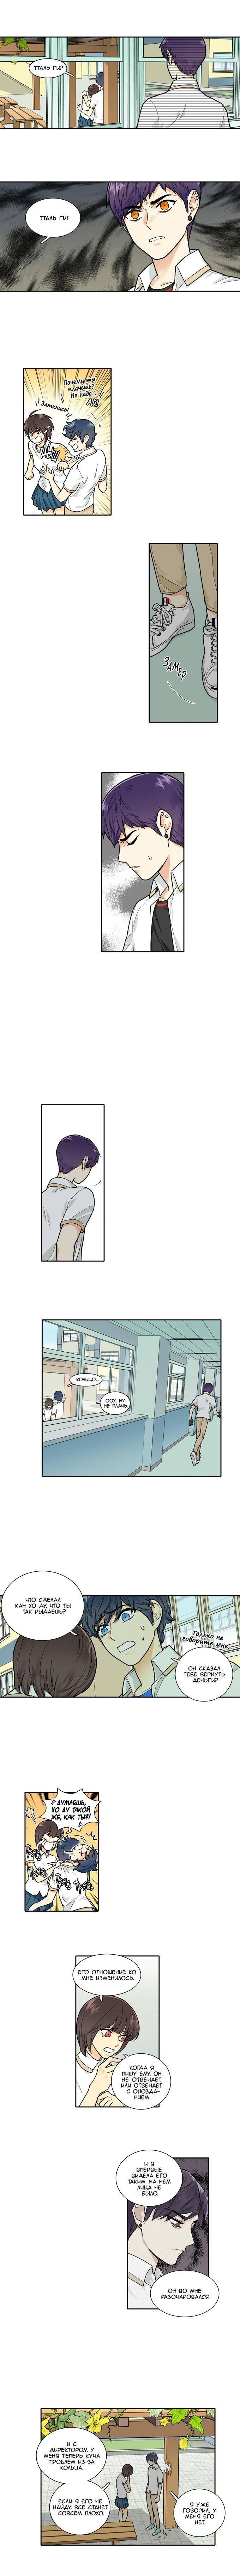 https://r1.ninemanga.com/comics/pic2/41/21609/311732/1477294547885.jpg Page 4